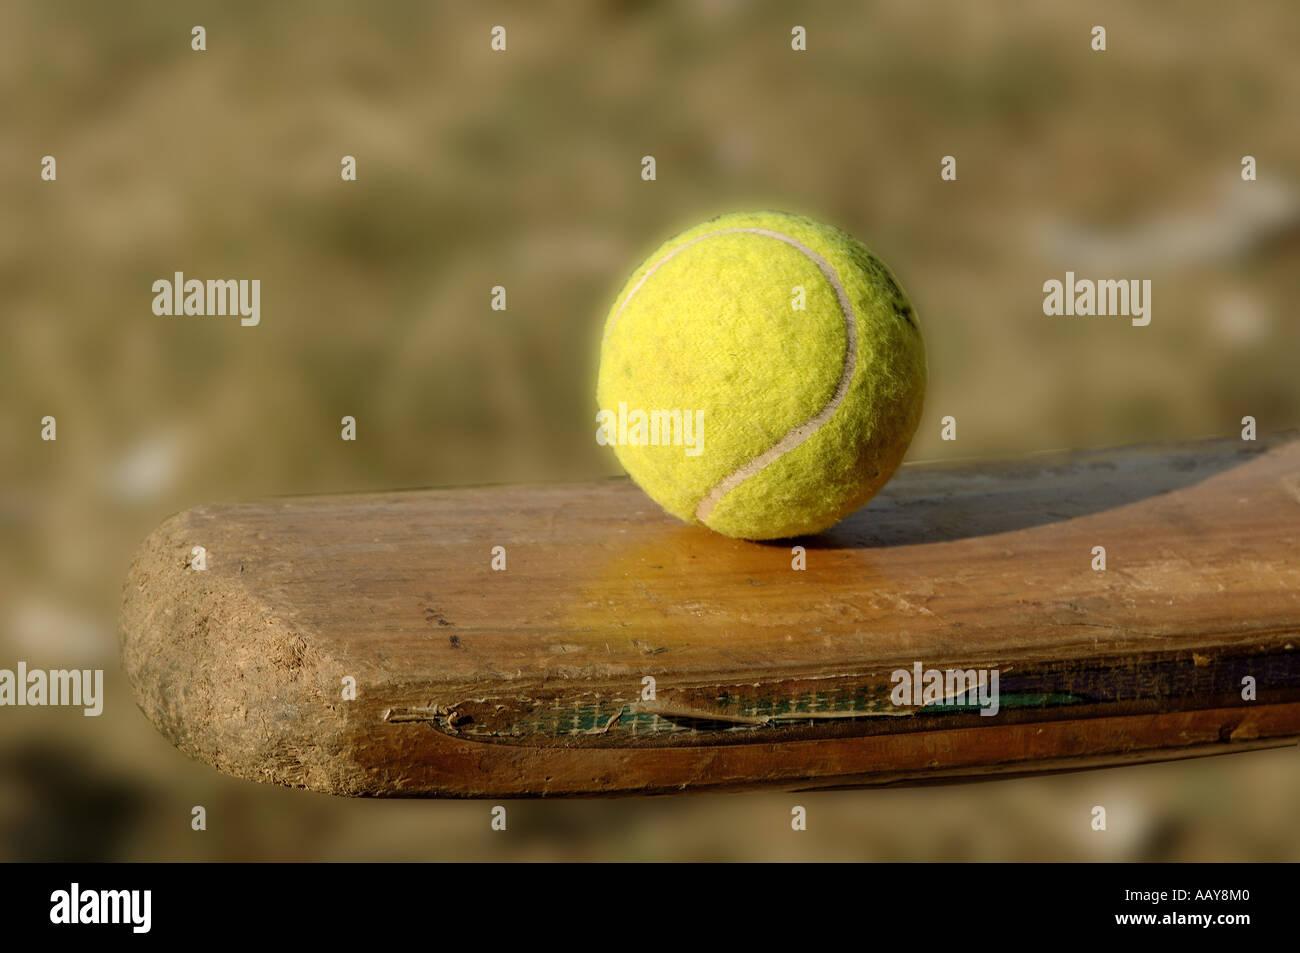 Hma78723 Tennis Ball Balancing On Surface Of Cricket Bat Stock Photo